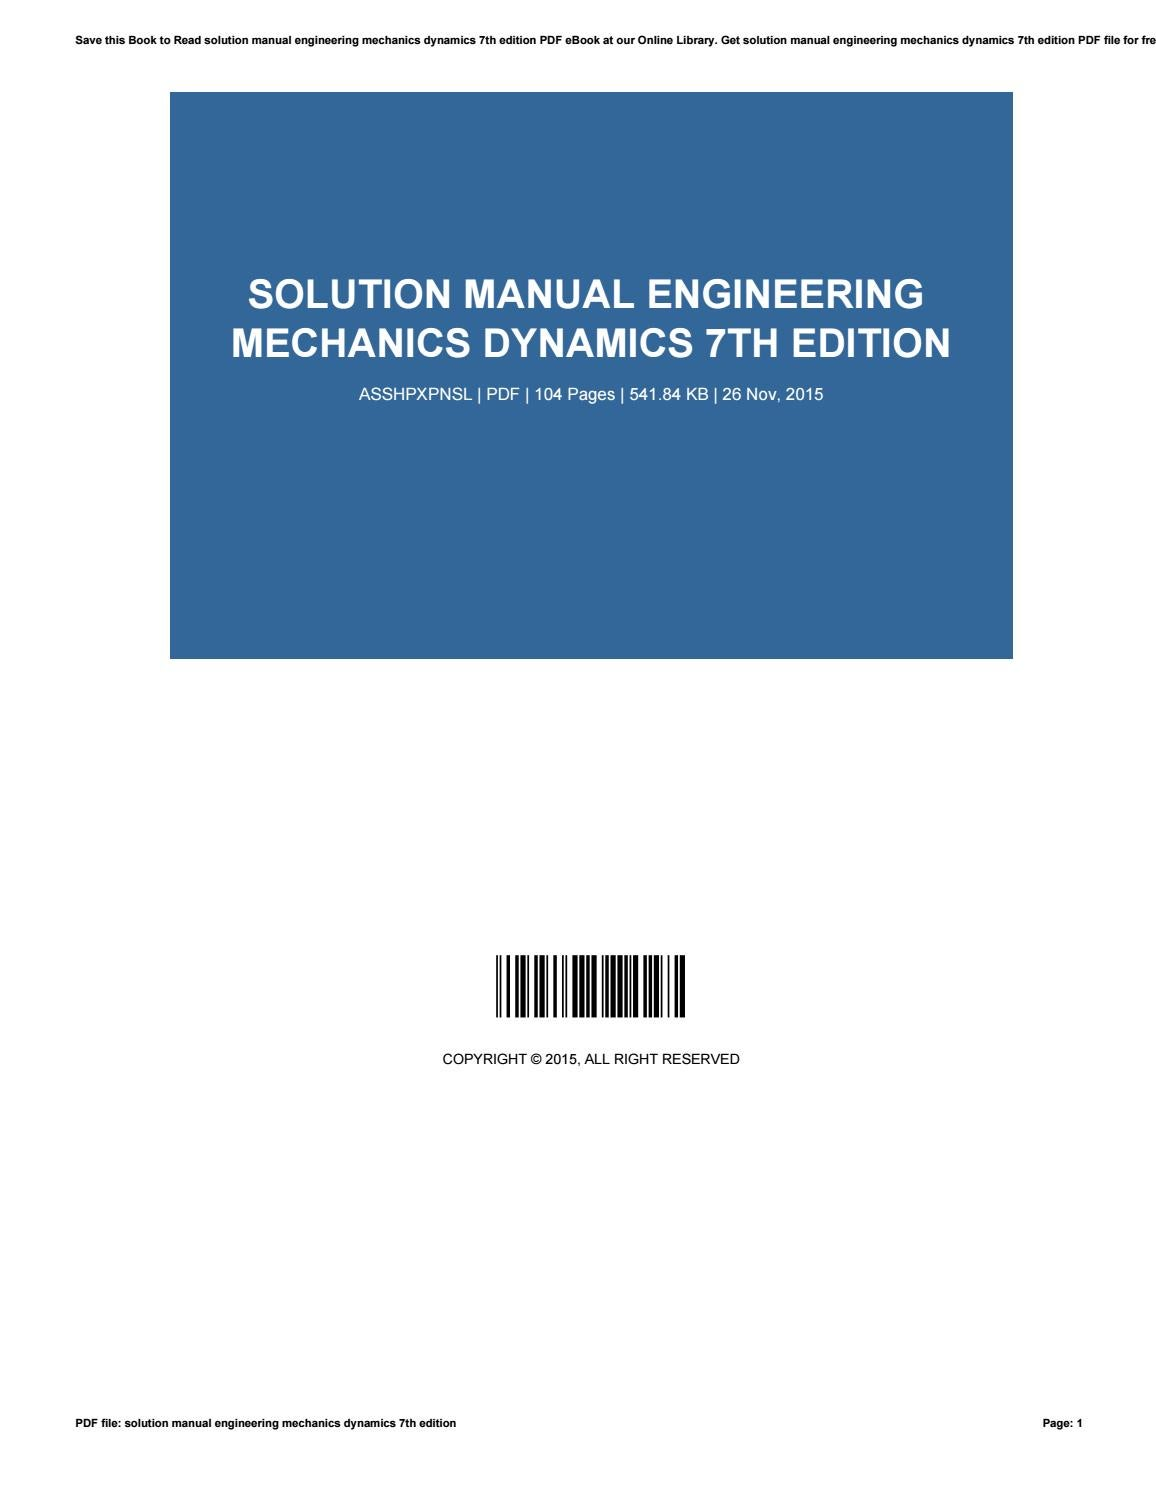 Solution manual engineering mechanics dynamics 7th edition by  KathleenScott3335 - issuu